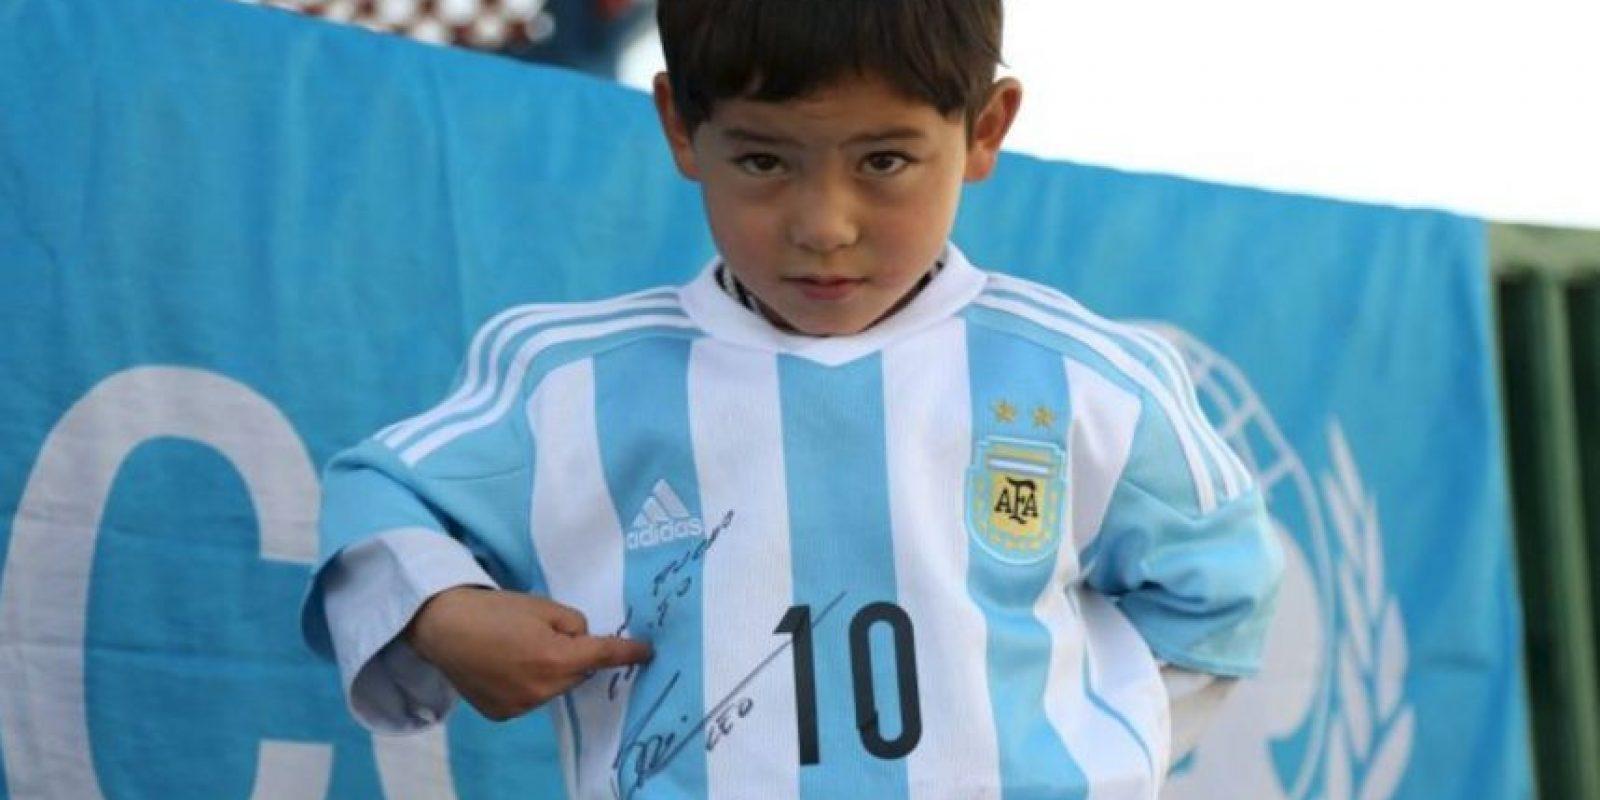 Murtaza cumplió parte de su sueño Foto:facebook.com/afghanistanunicef/